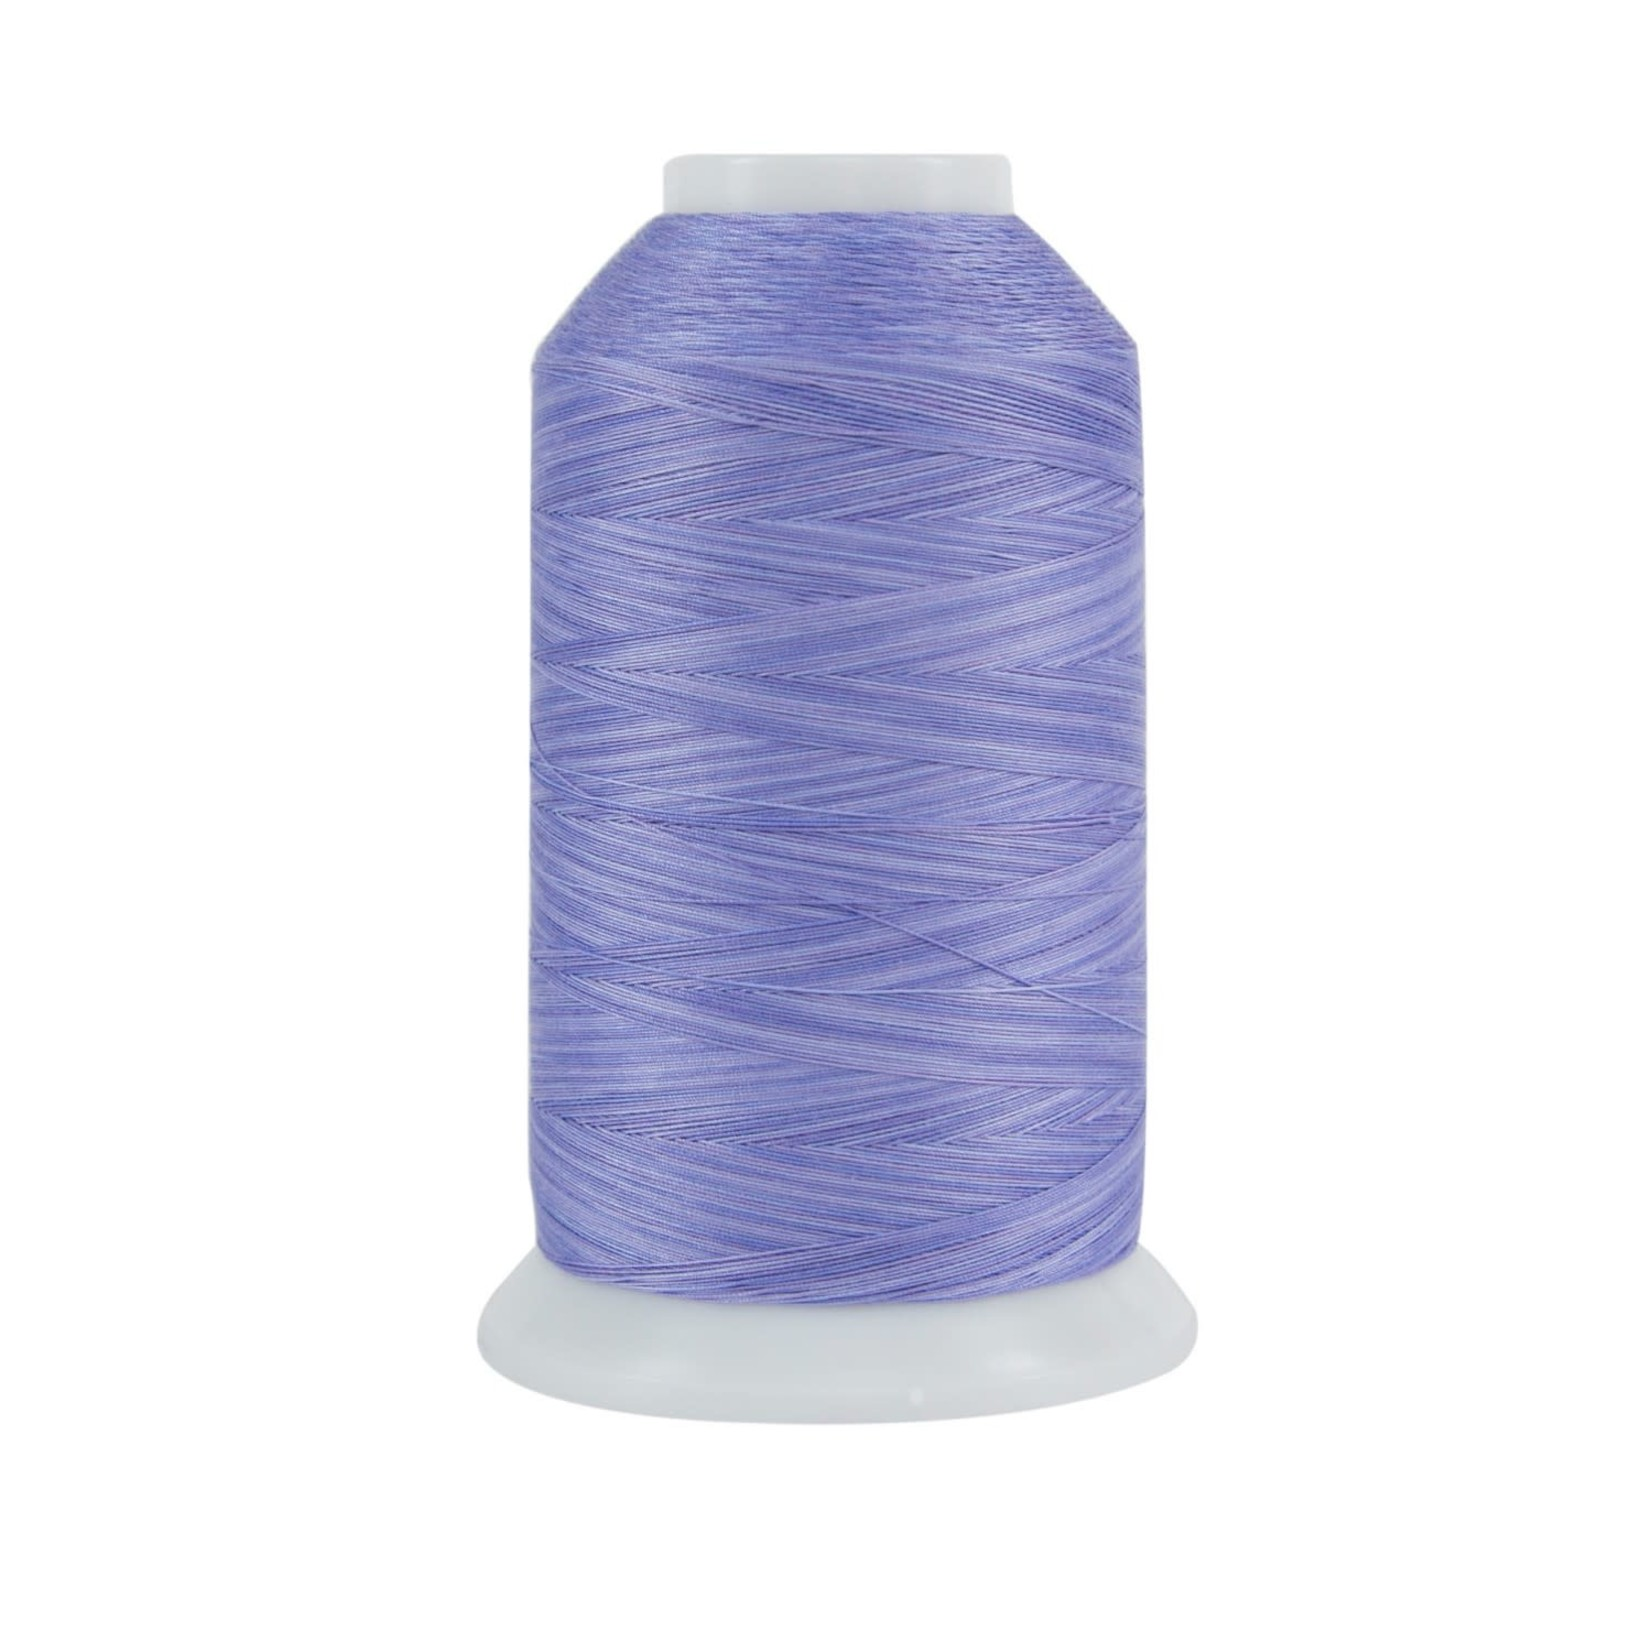 Superior Threads King Tut - #40 - 1828 m - 0942 Wisteria Lane